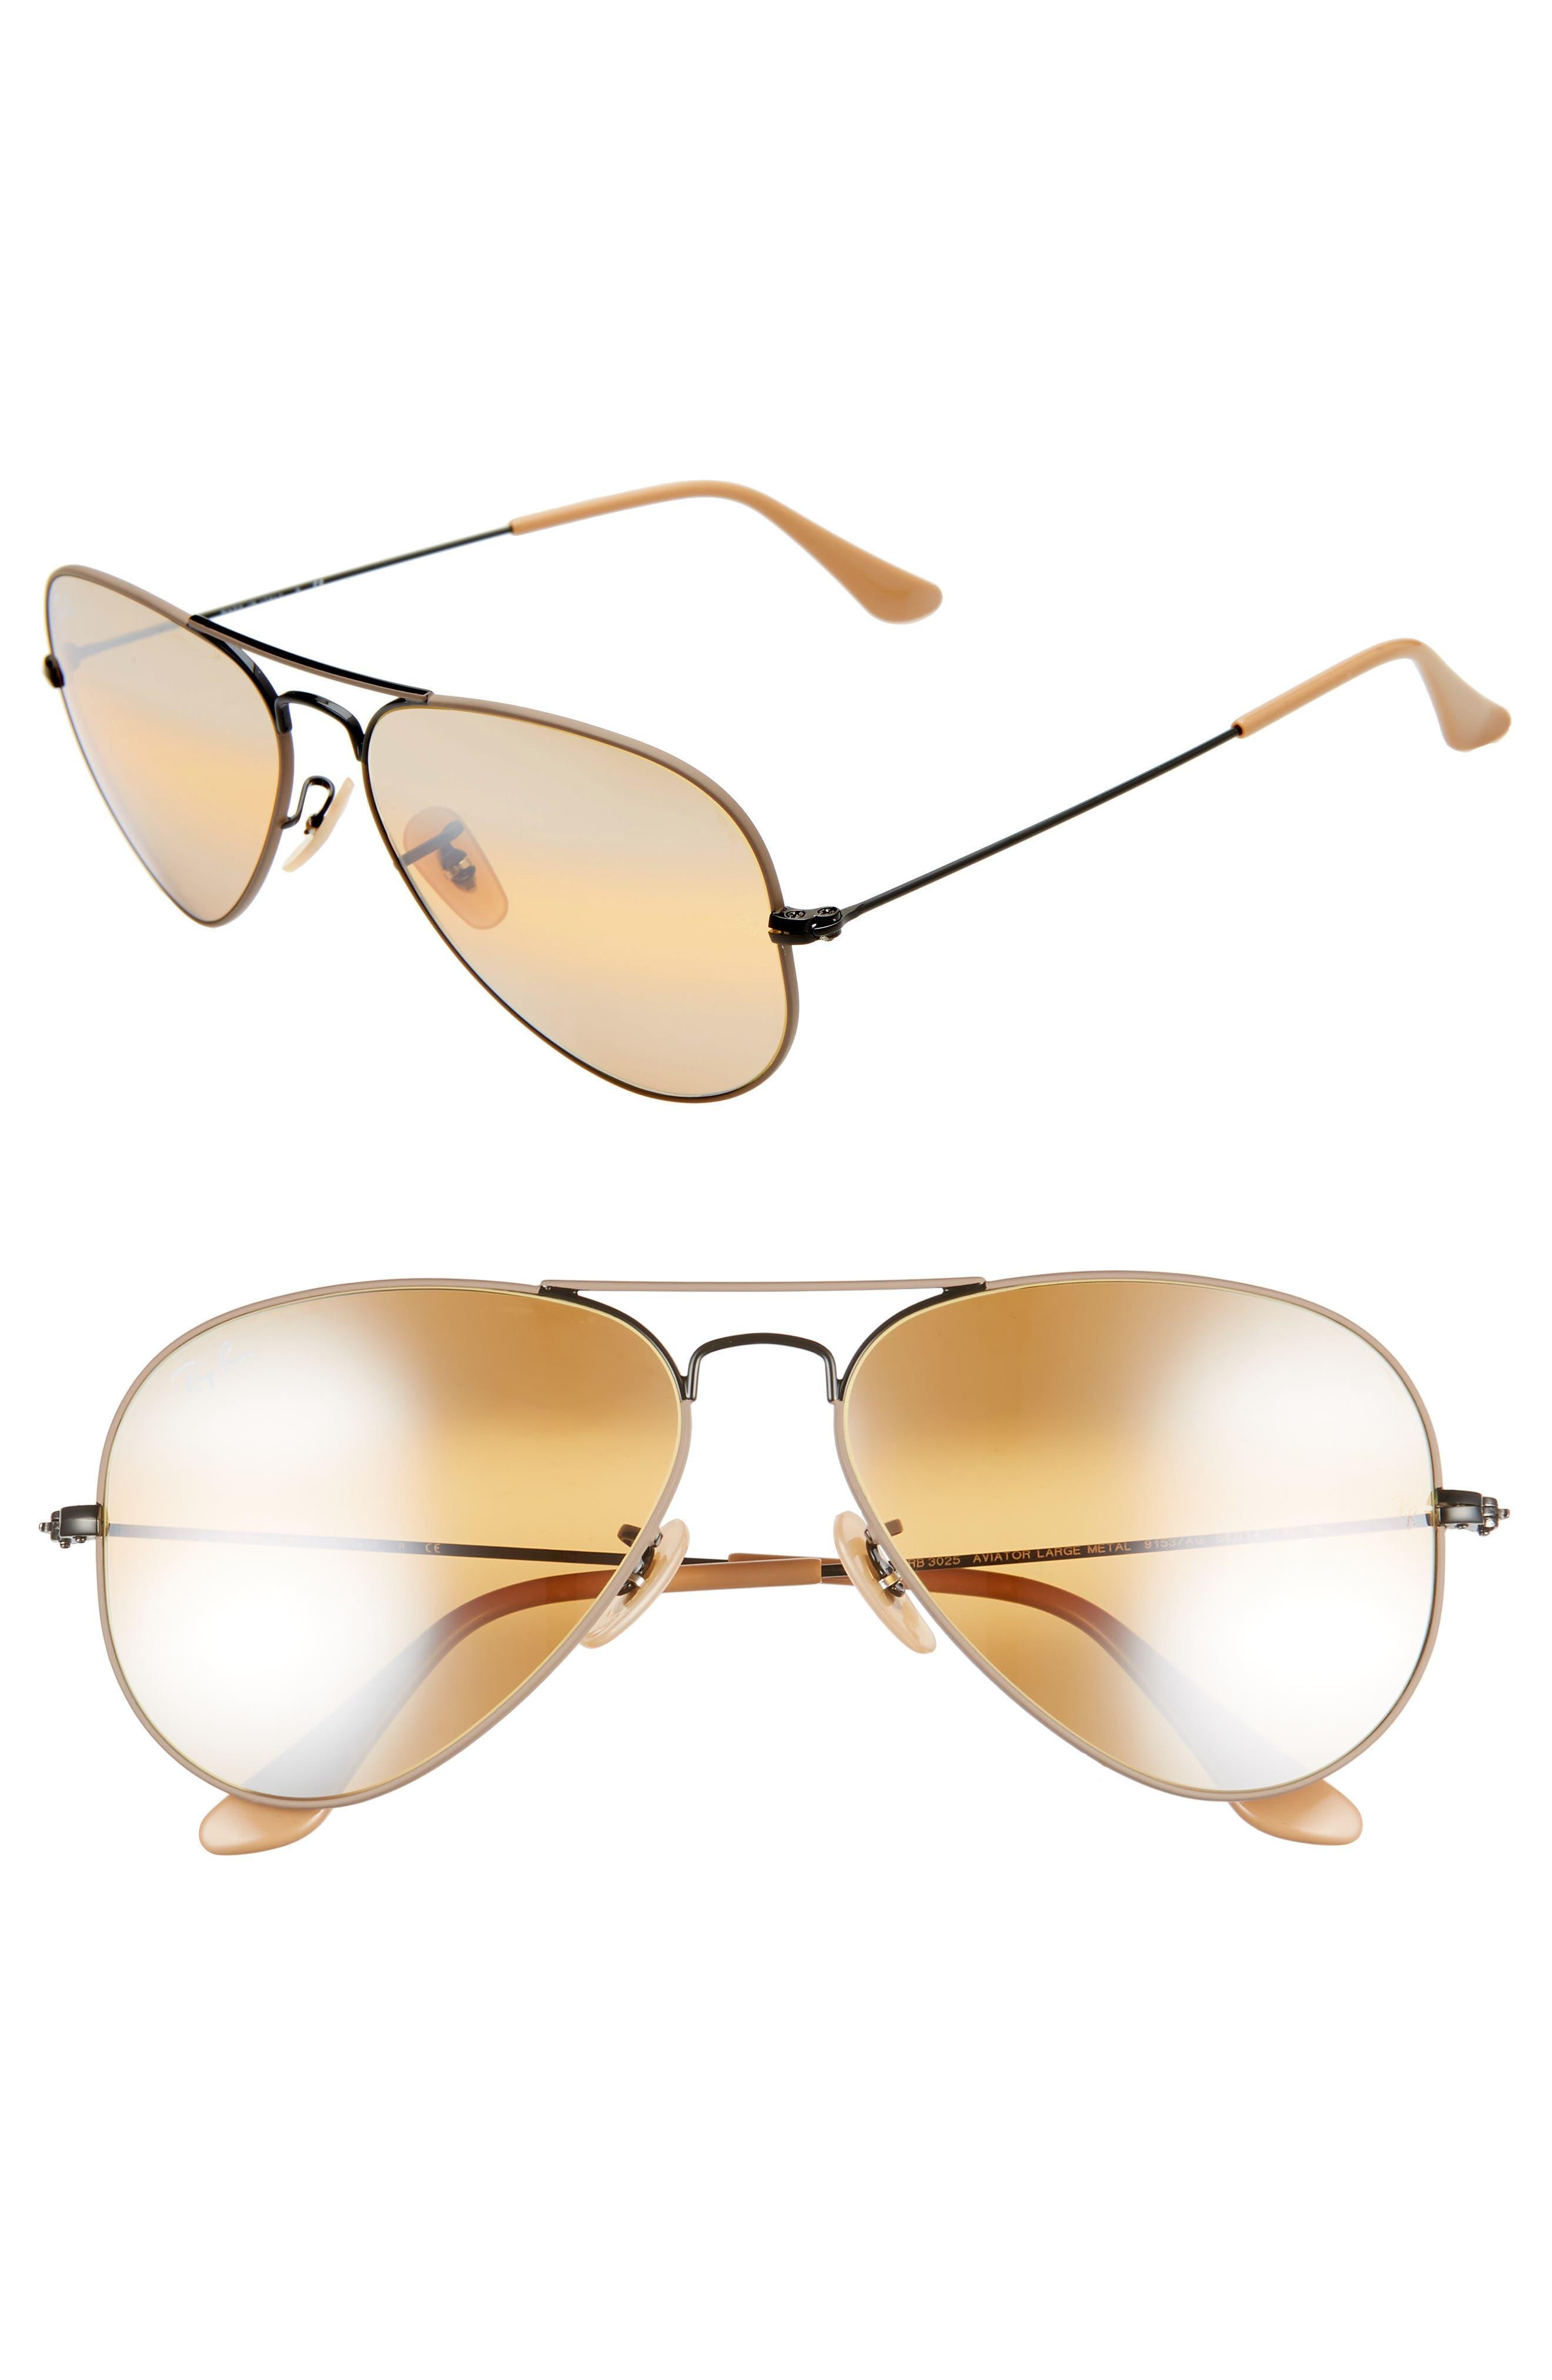 RAY-BAN Standard Original 58mm Aviator Sunglasses, Main, color, BEIGE/ BLACK MIRROR